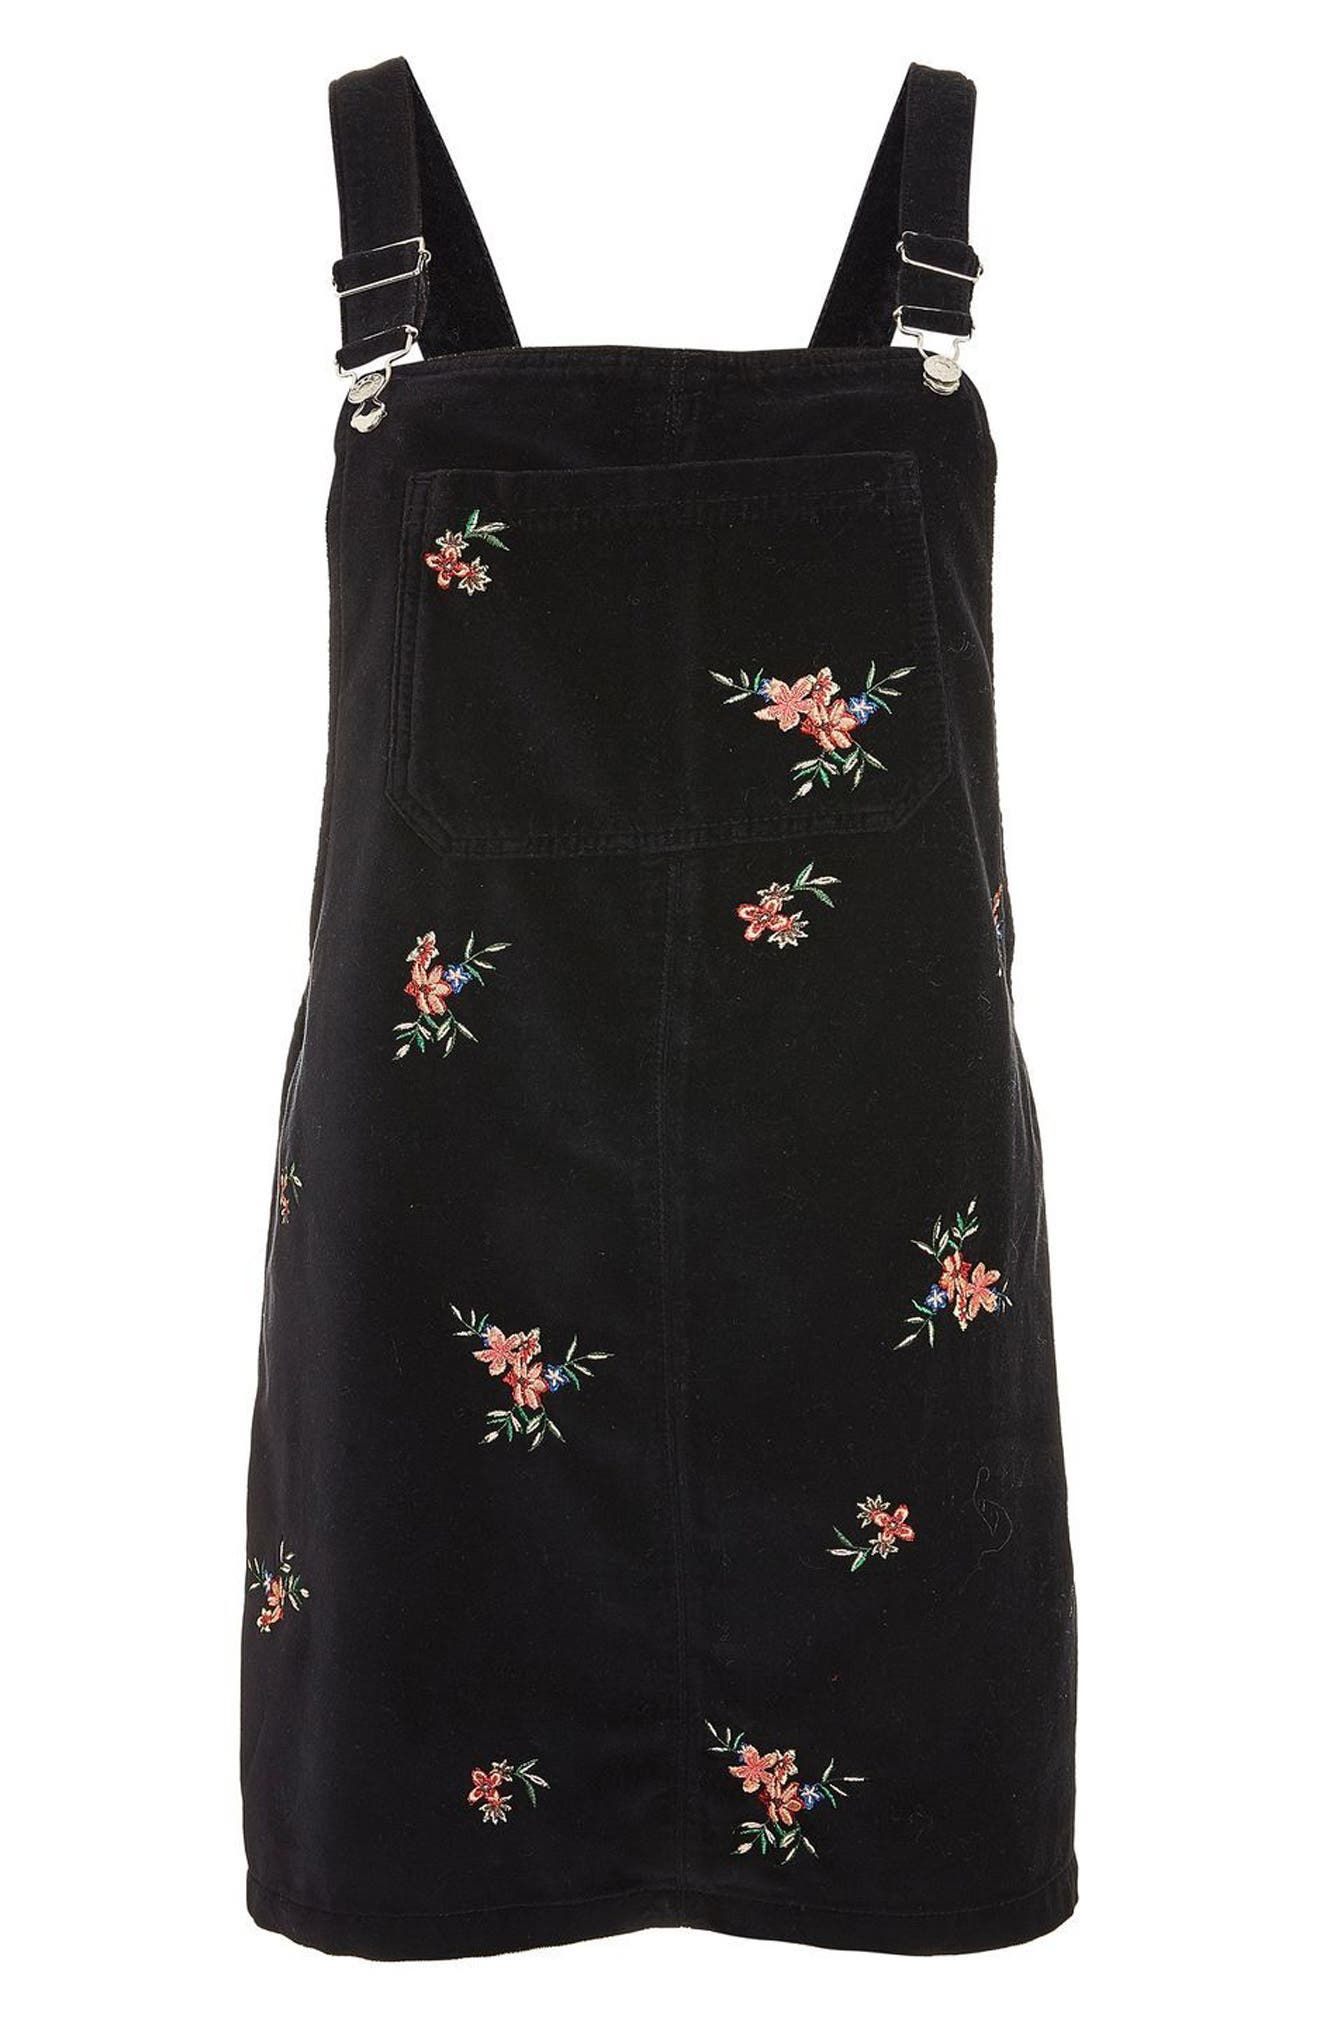 Embroidered Velvet Pinafore Dress,                             Alternate thumbnail 4, color,                             Black Multi